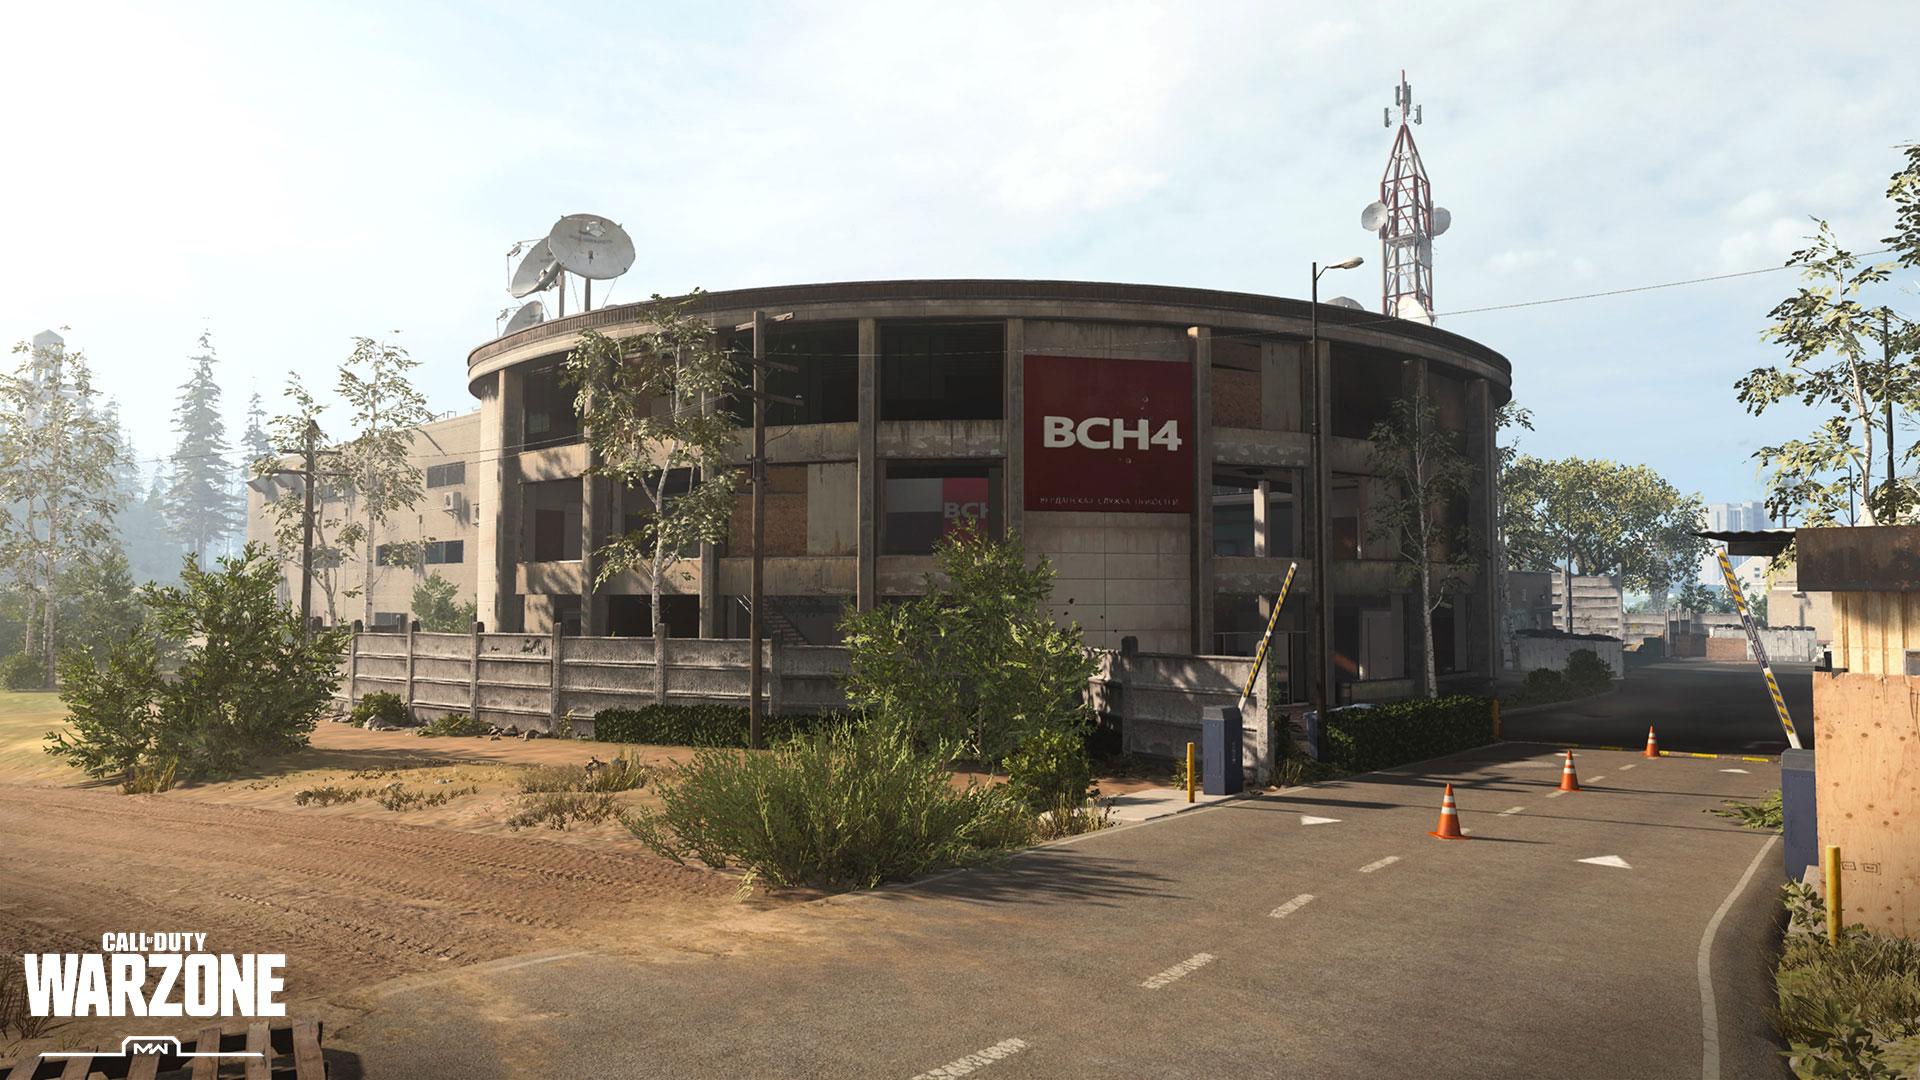 Warzone TV station